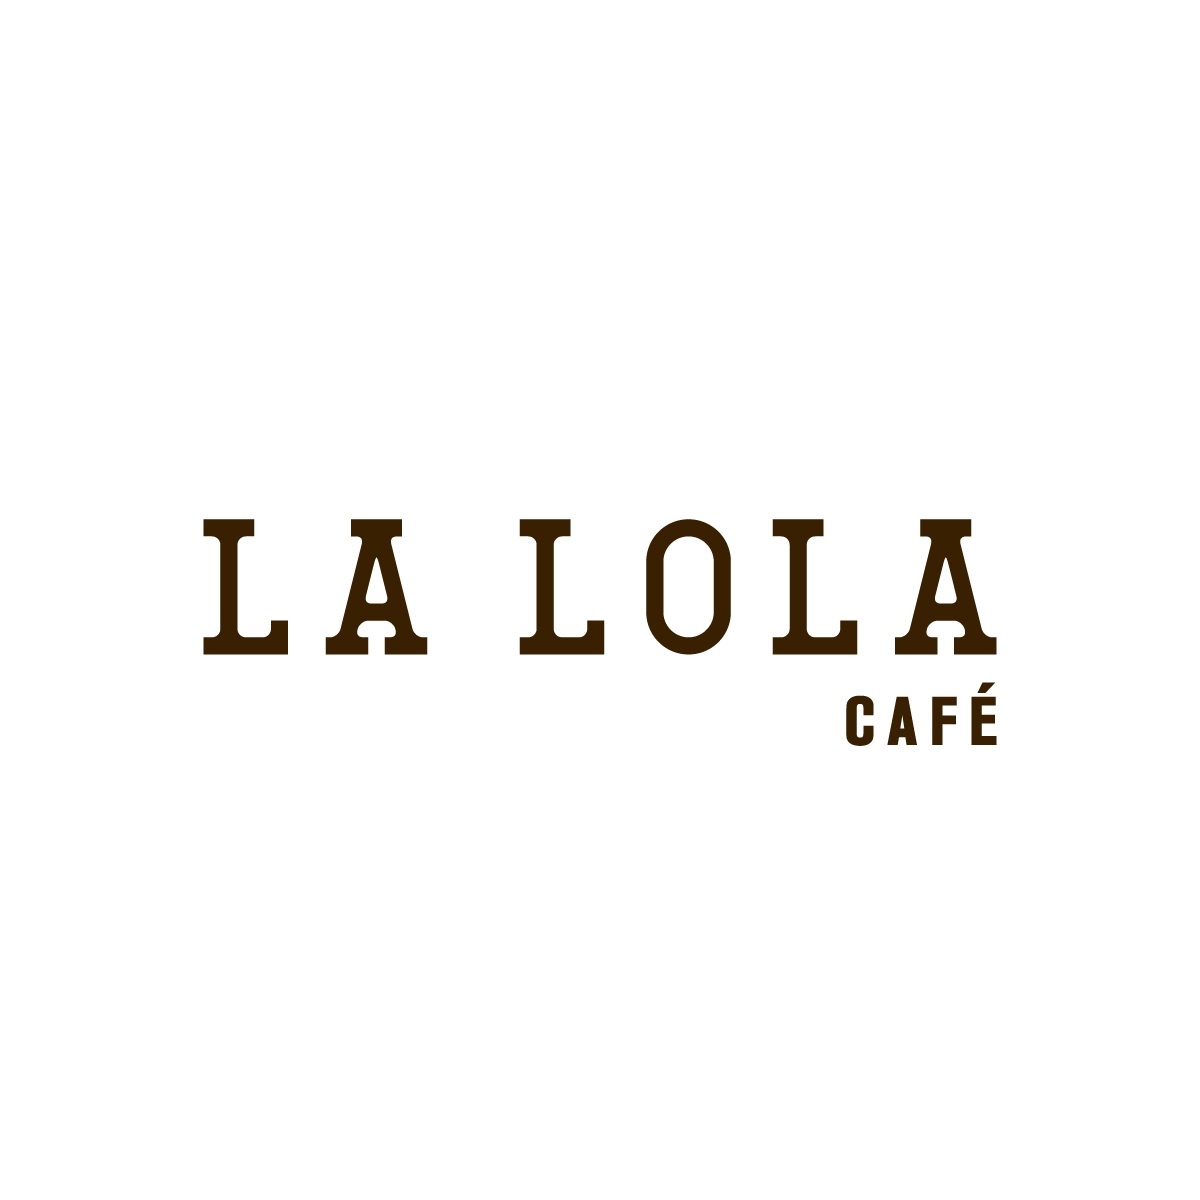 La Lola Cafe brand logo